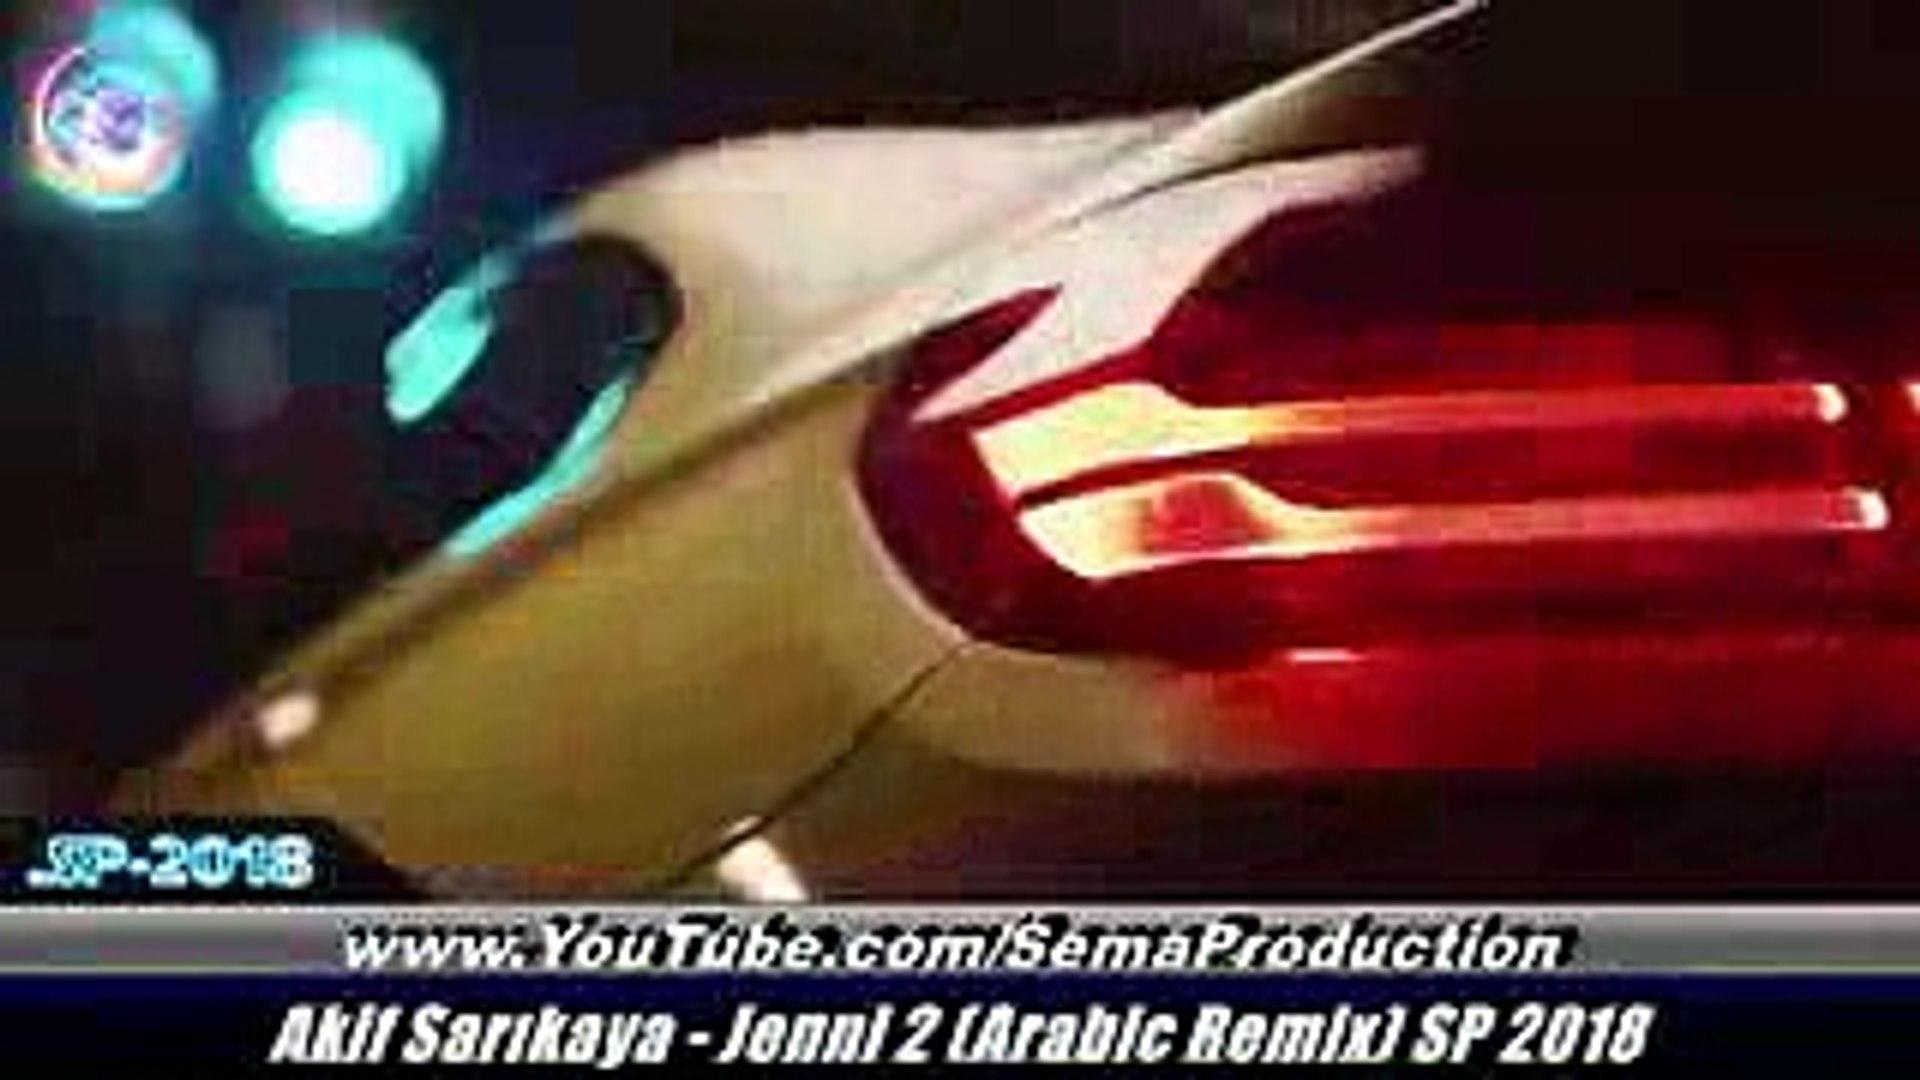 Arabic Remix - Jenni 2 (Akif Sarıkaya Remix) SP 2018